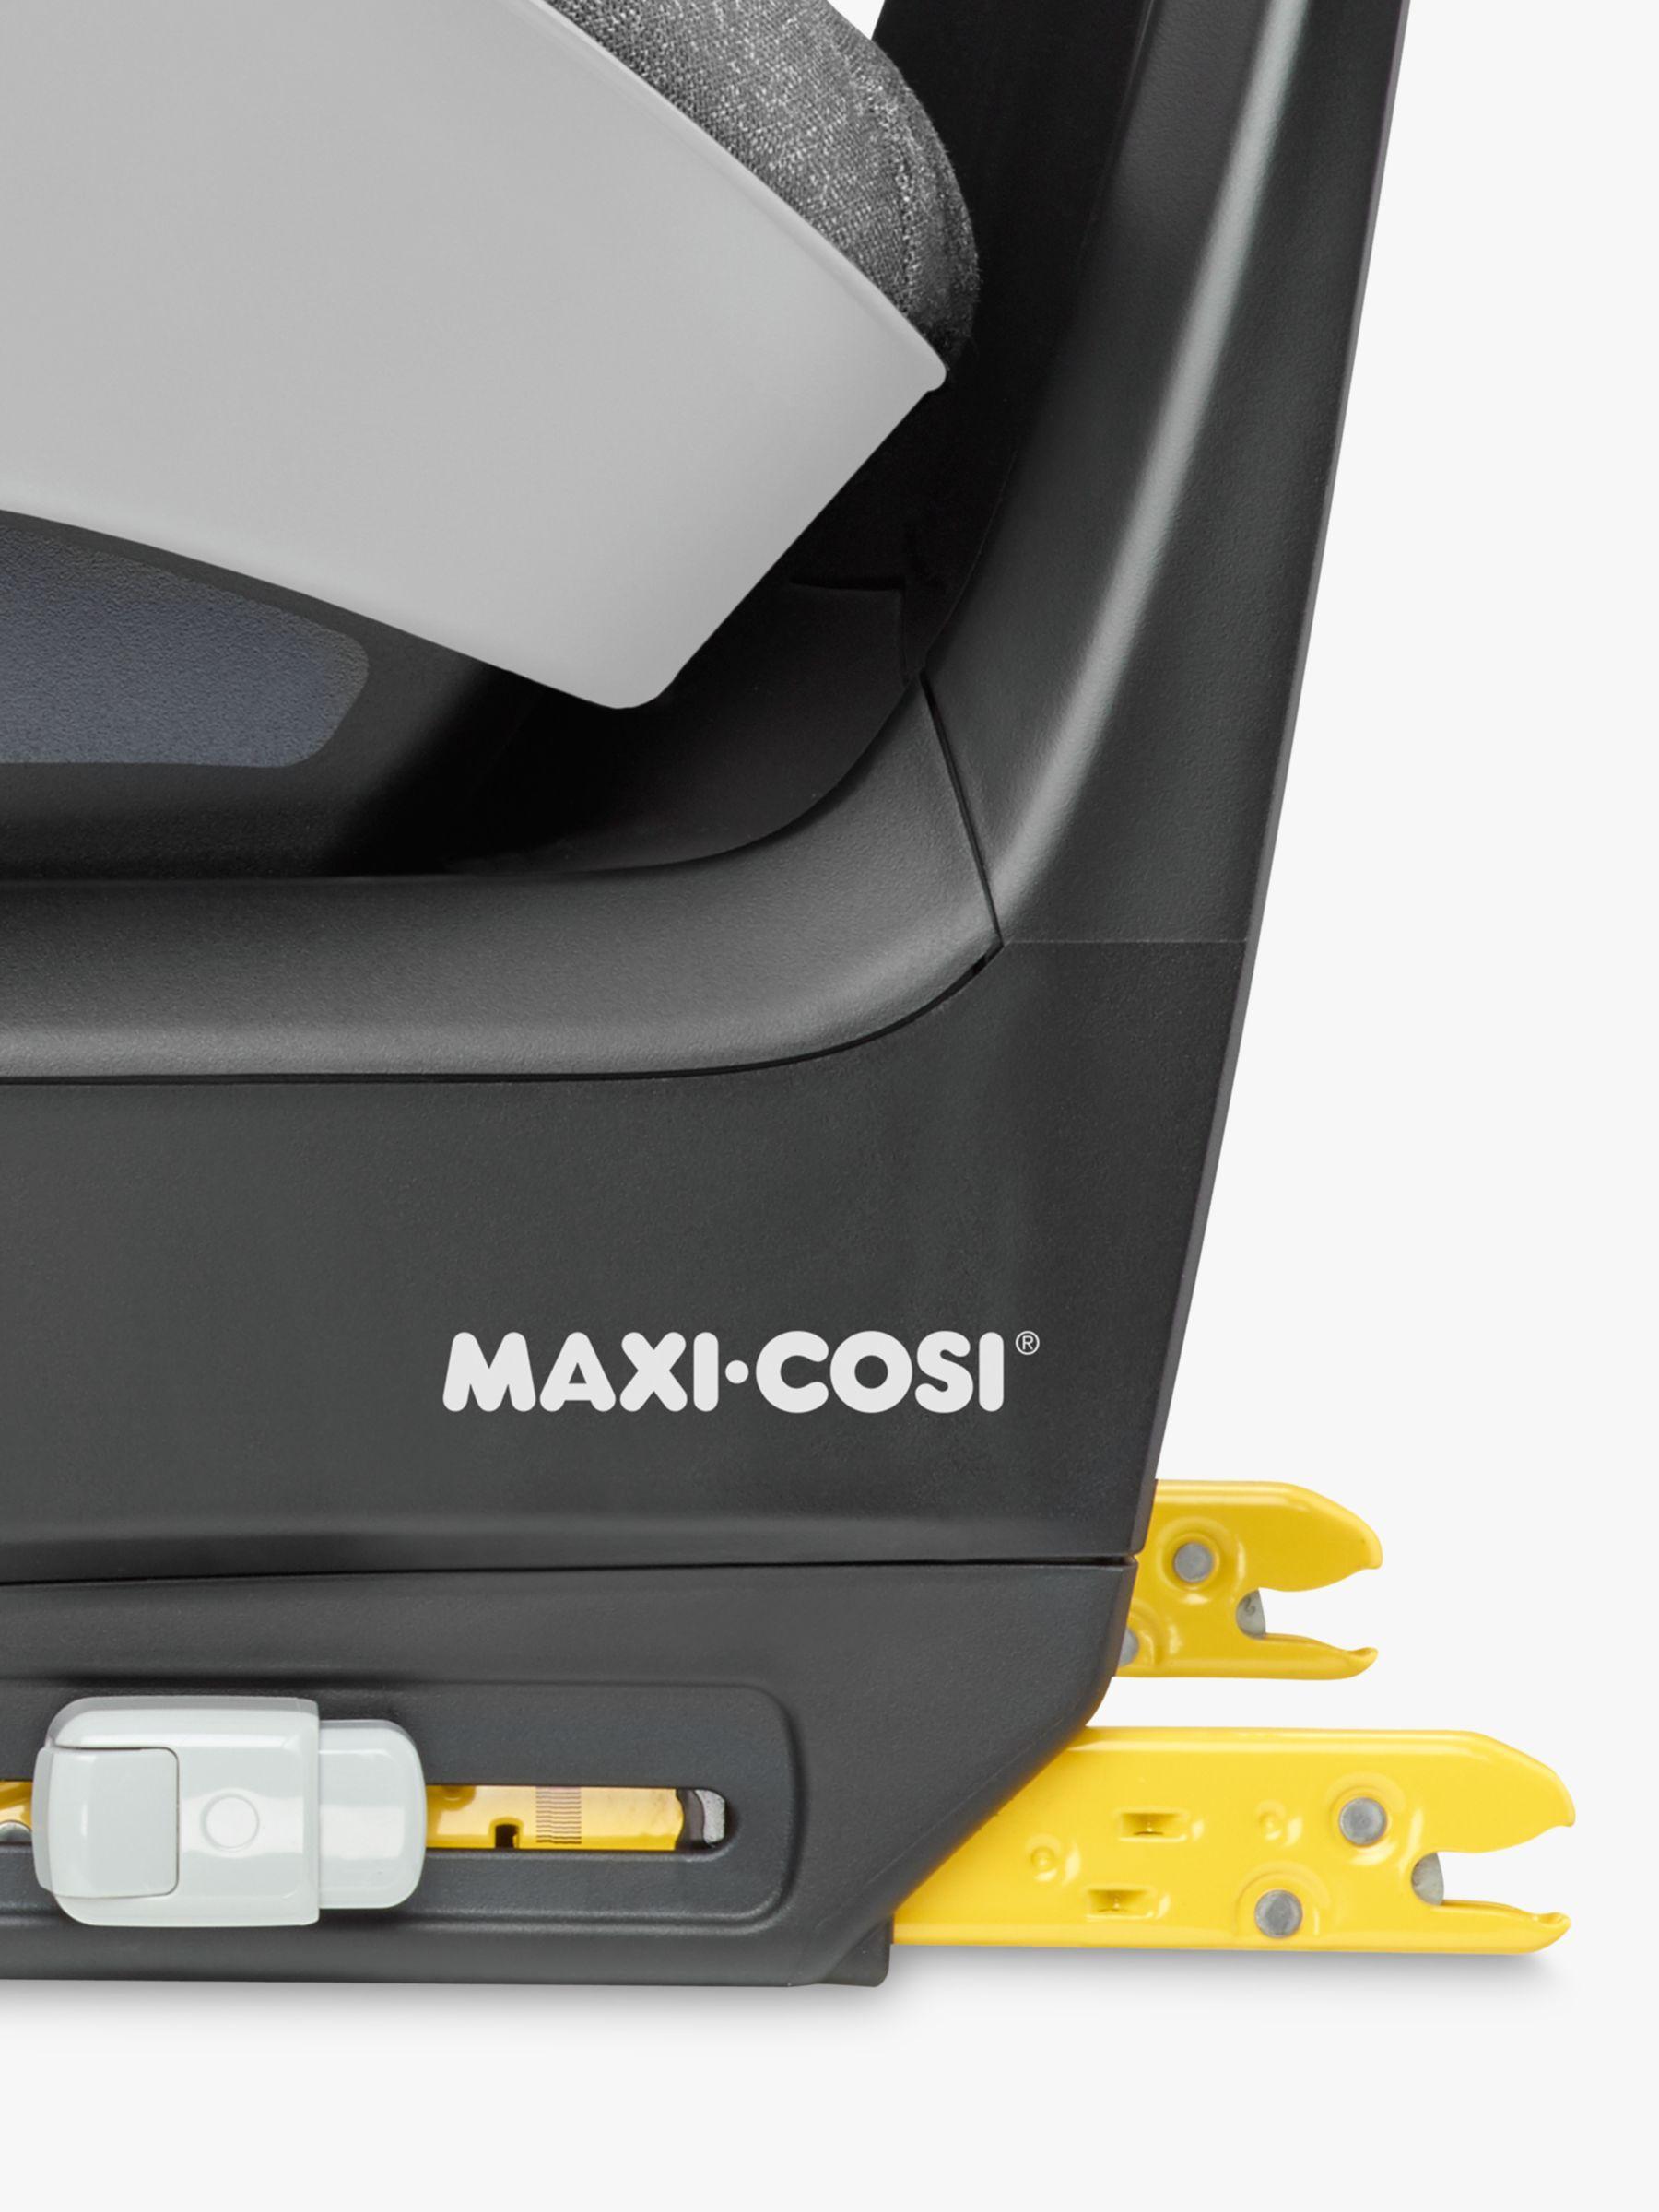 Maxi Cosi Babyfix I Size Car Seat Base Black In 2020 Car Seats Car My Size